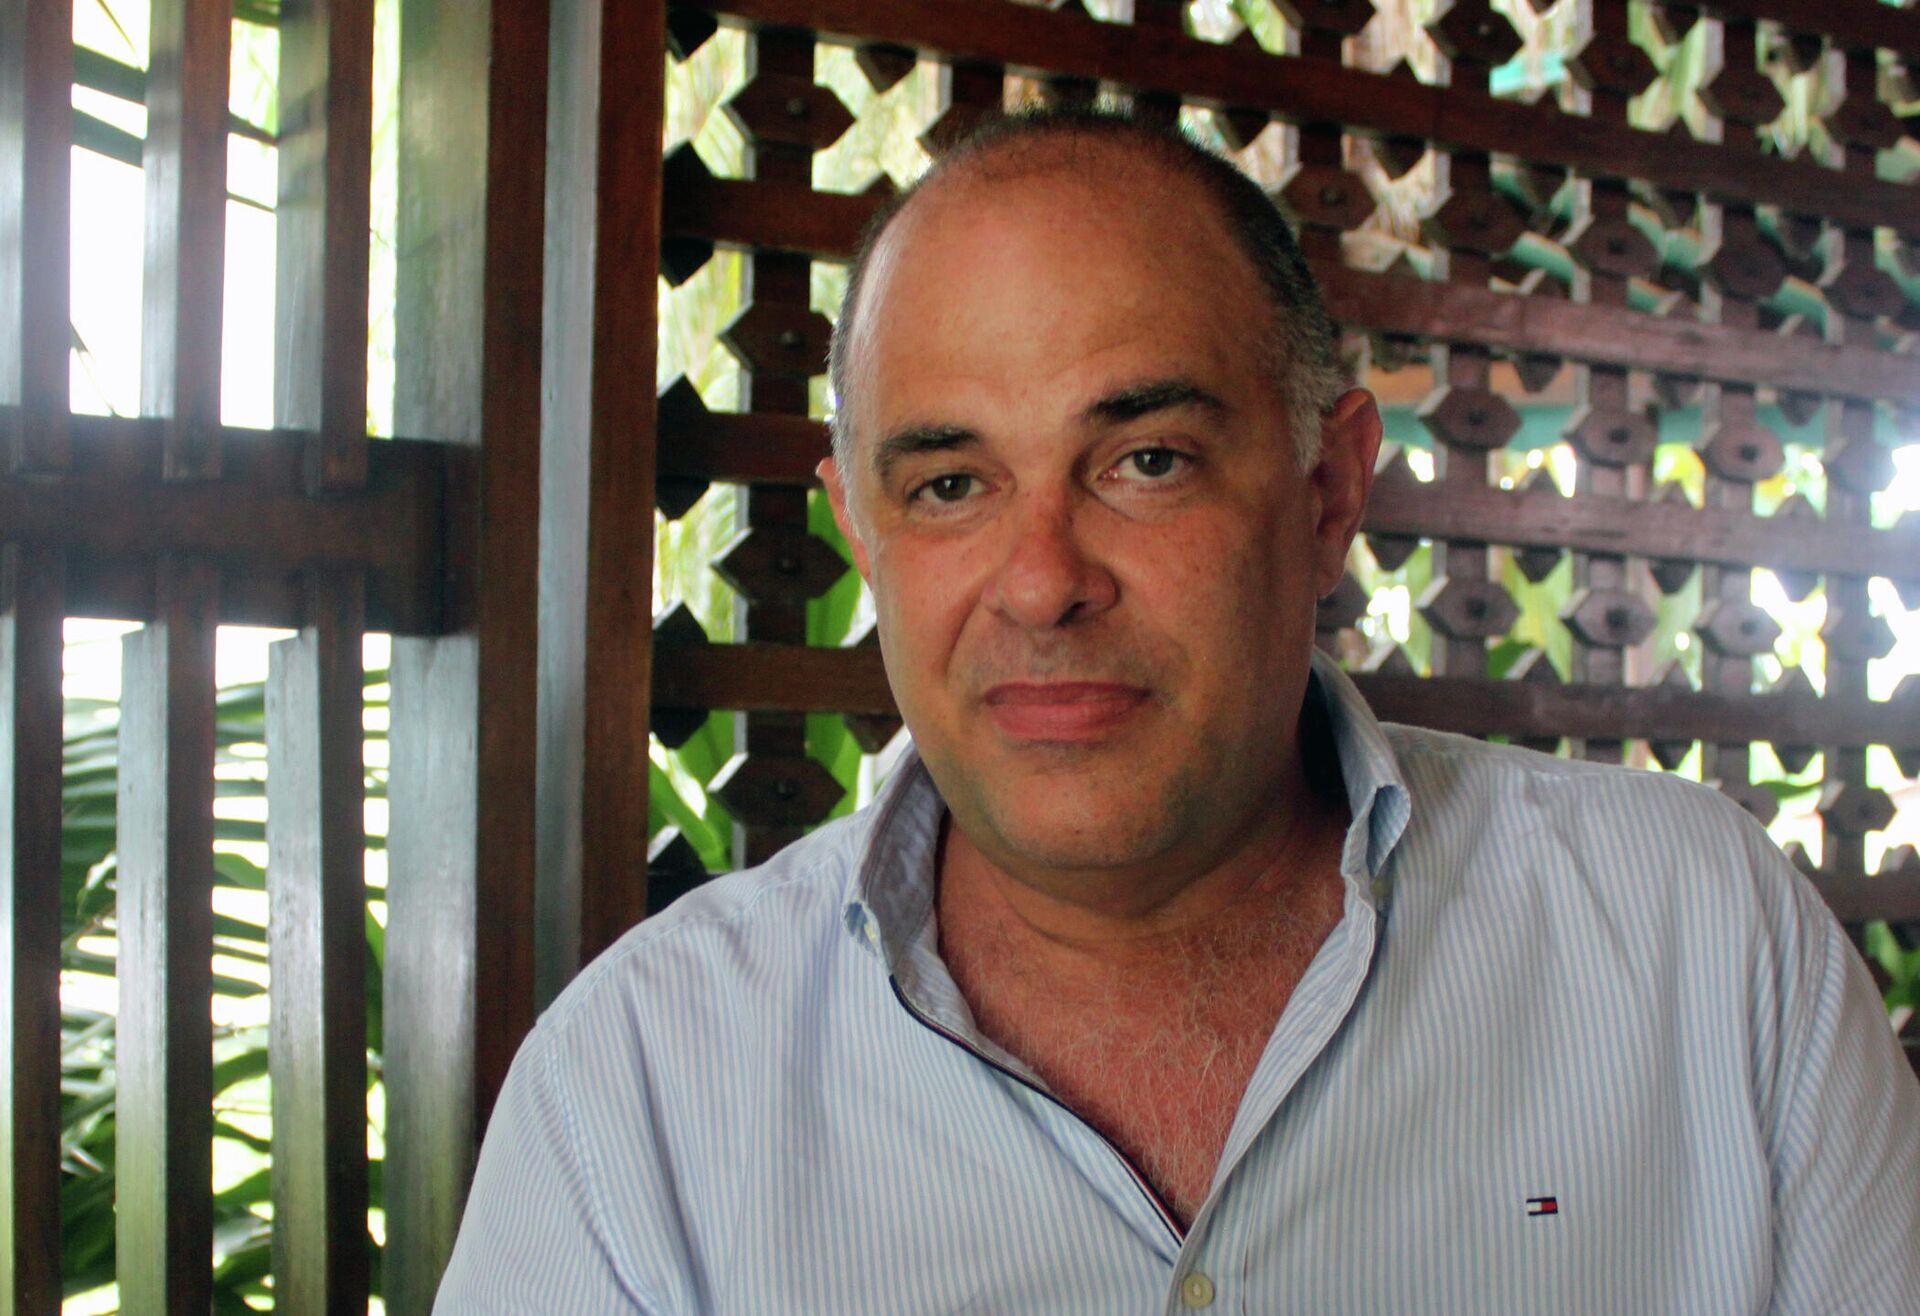 Humberto Pérez, coordinador de grupos solidarios con Cuba desde Panamá - Sputnik Mundo, 1920, 08.10.2021